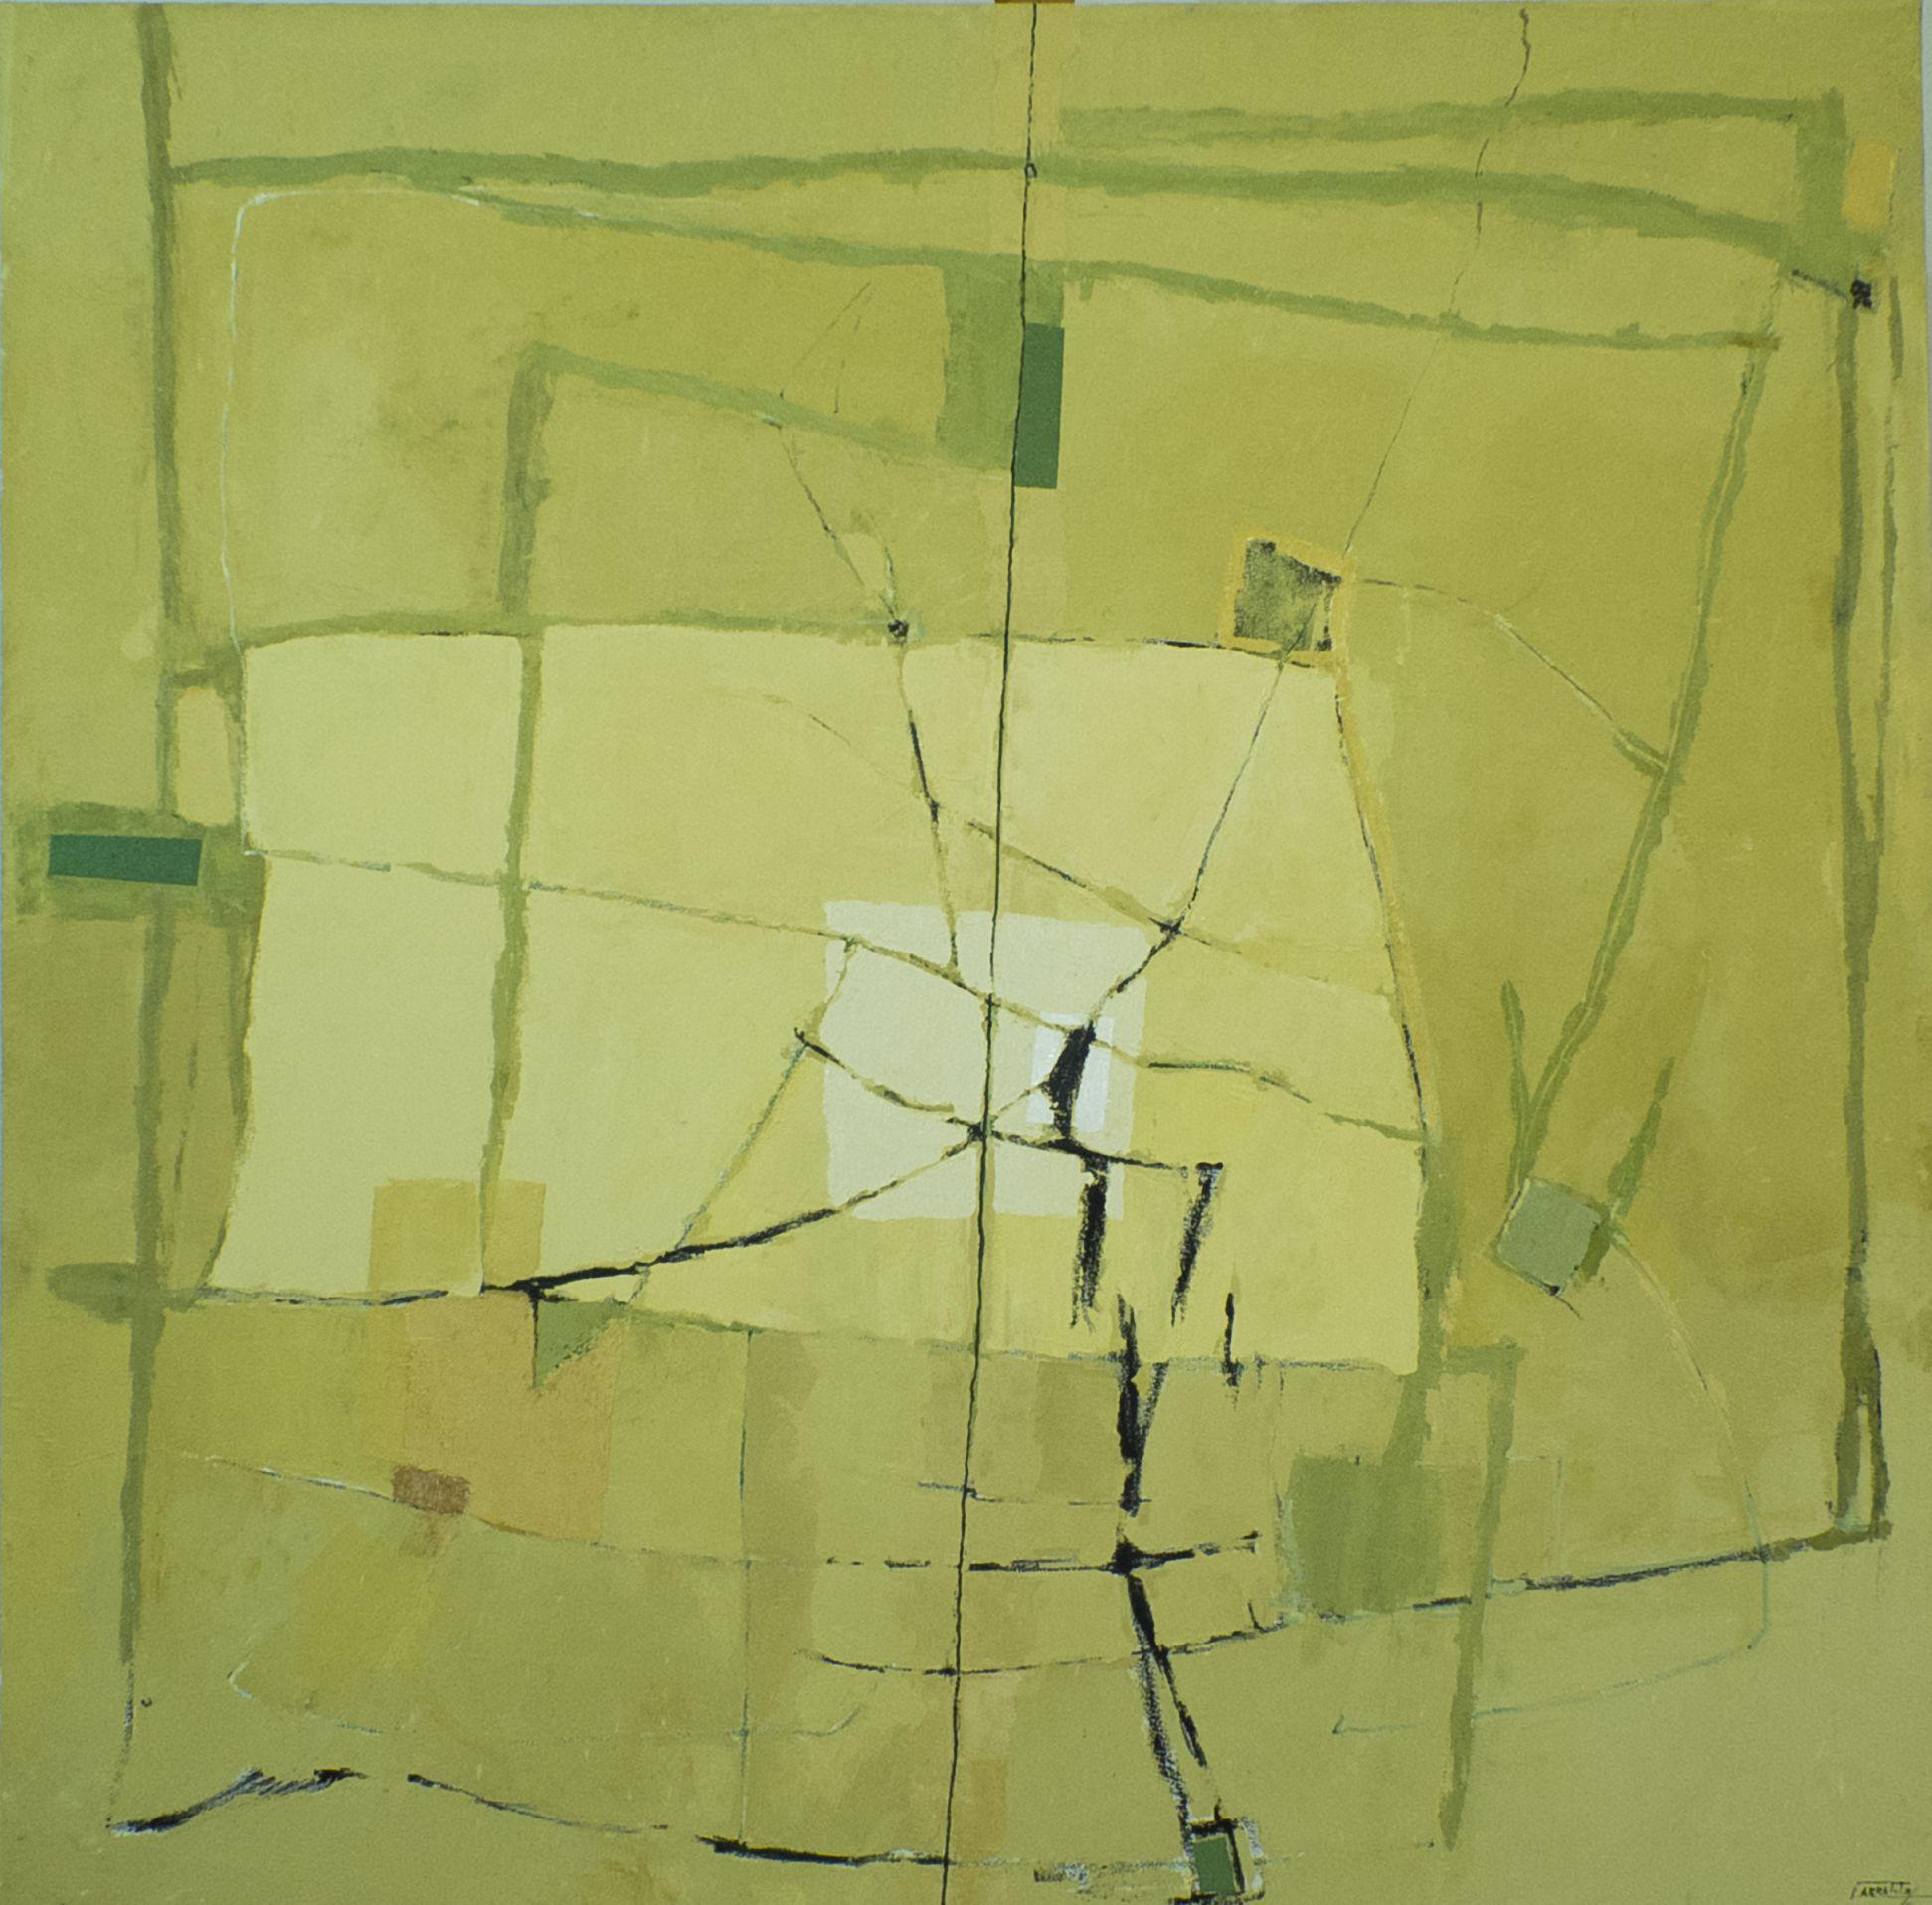 Arbol seco (2014) - Pedro Carrasco